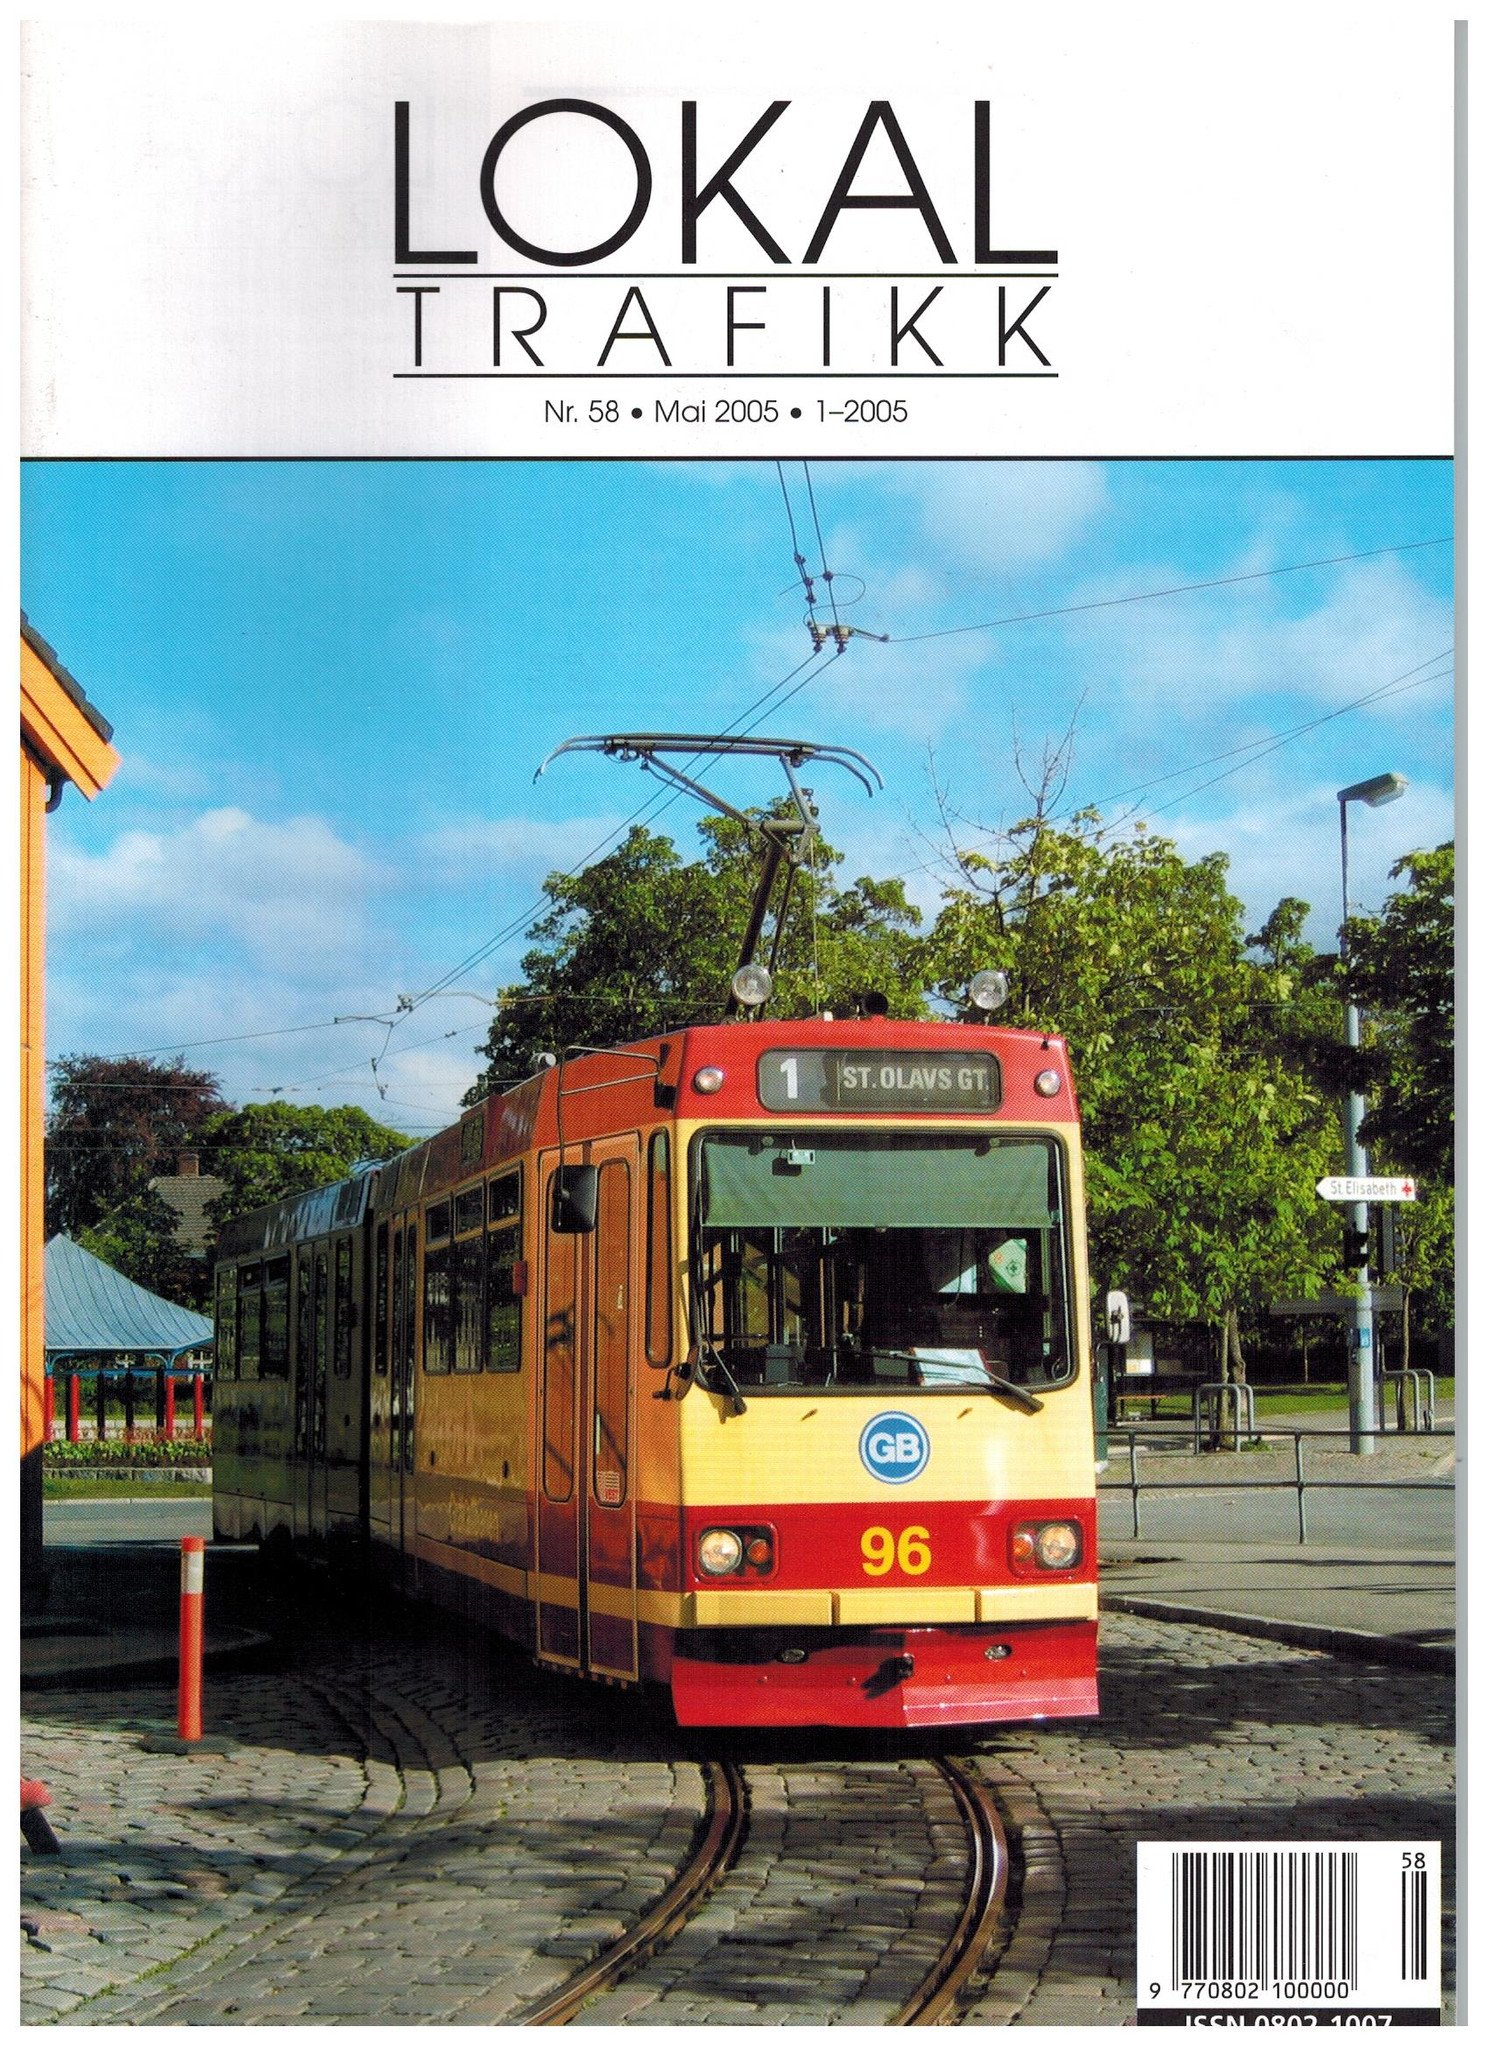 Lokaltrafikk #058